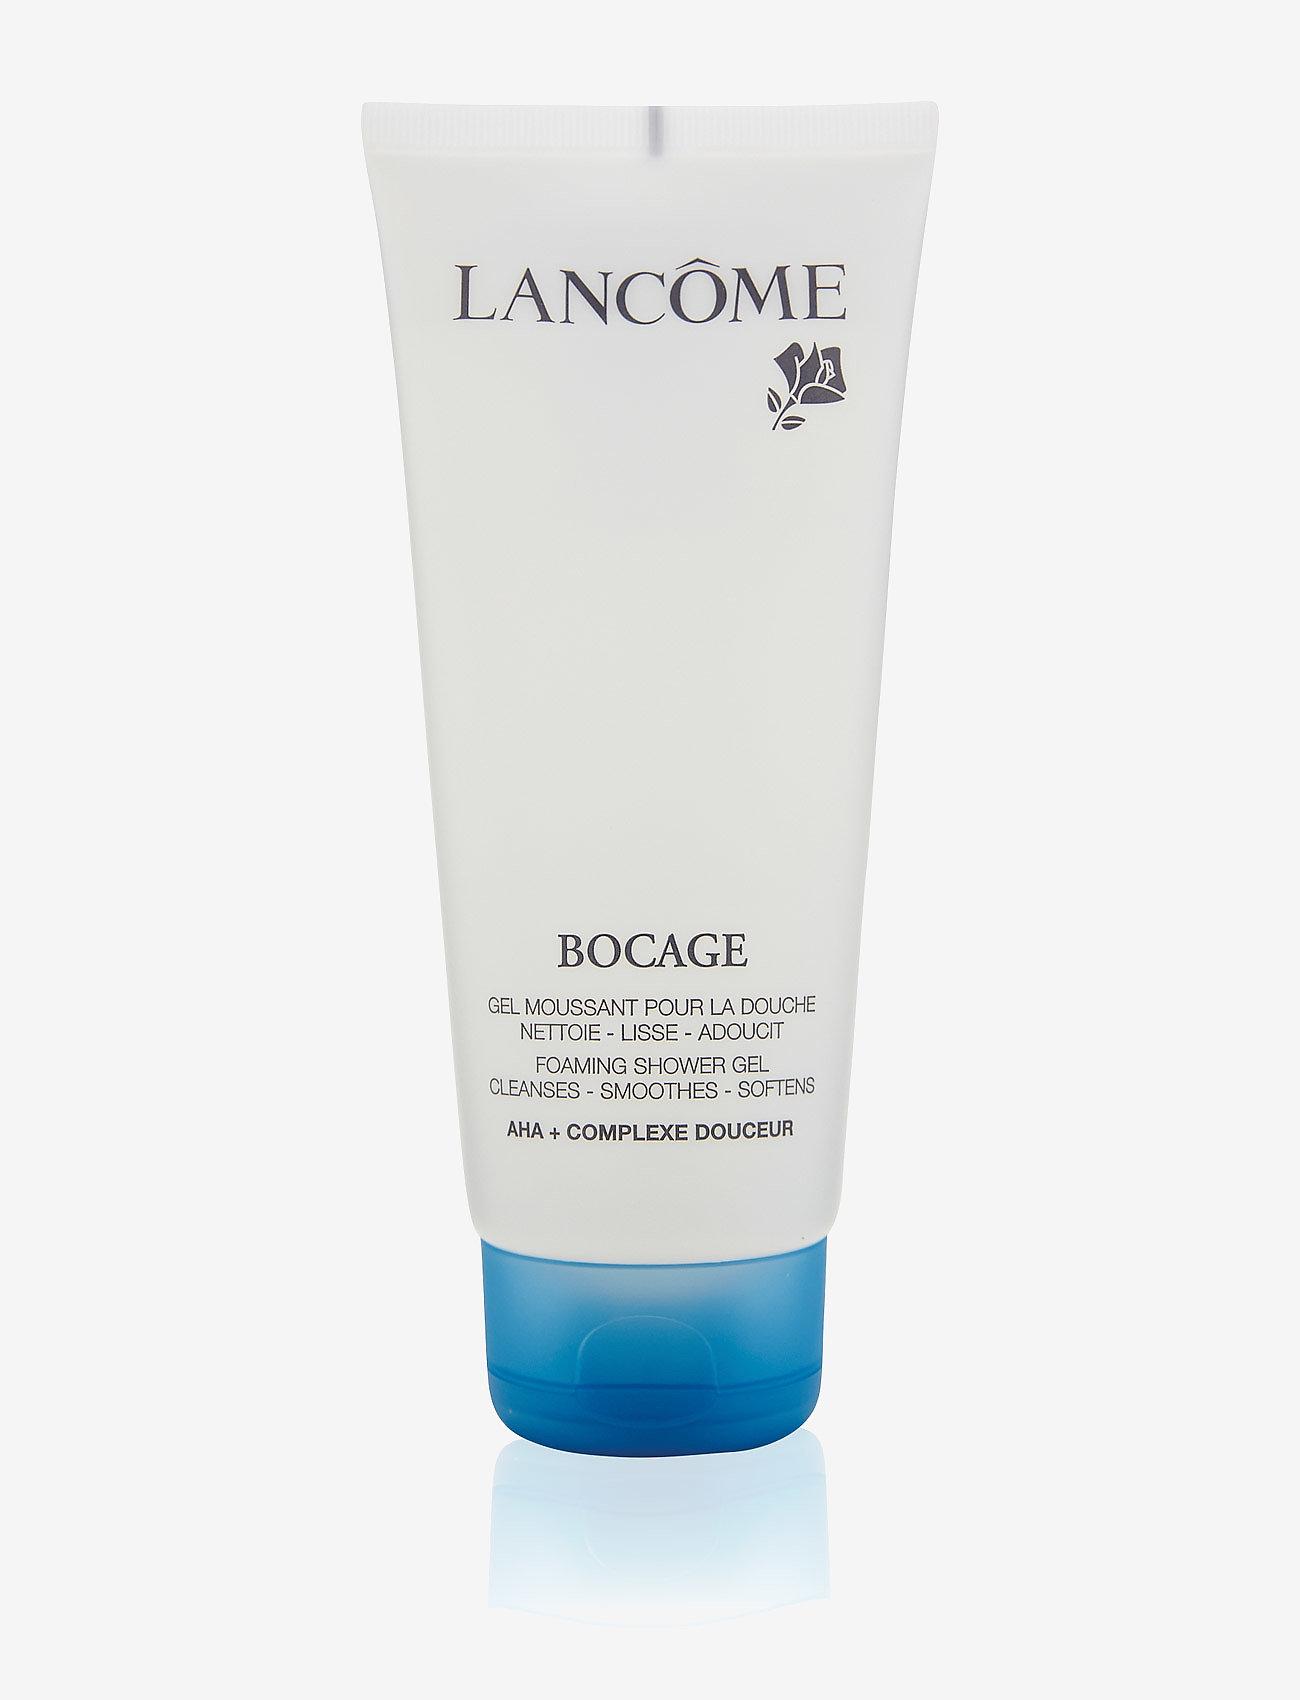 Lancôme - Bocage Shower Gel 200 ml - suihkugeeli - clear - 0